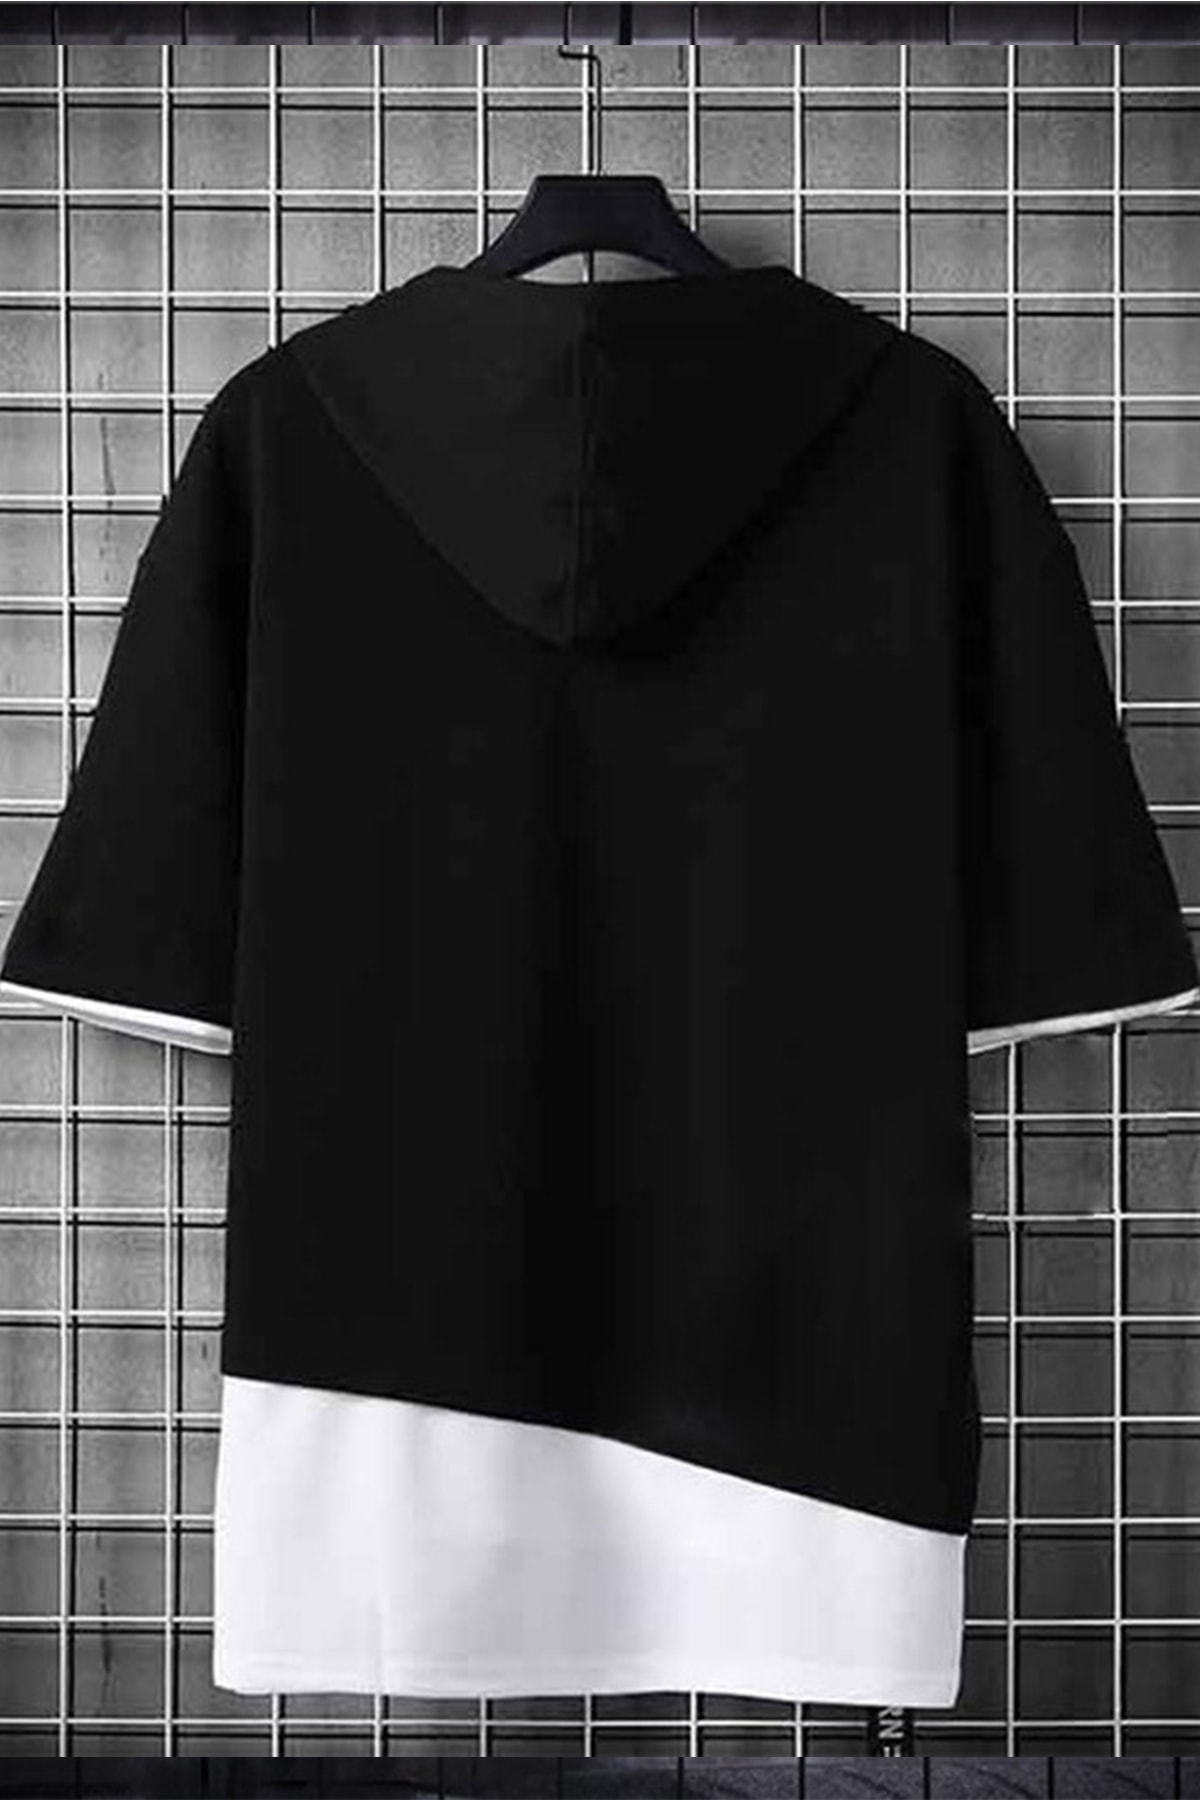 DE PLEIN Unisex Siyah Oversize Kapüşonlu % 100 Pamuk T-shirt